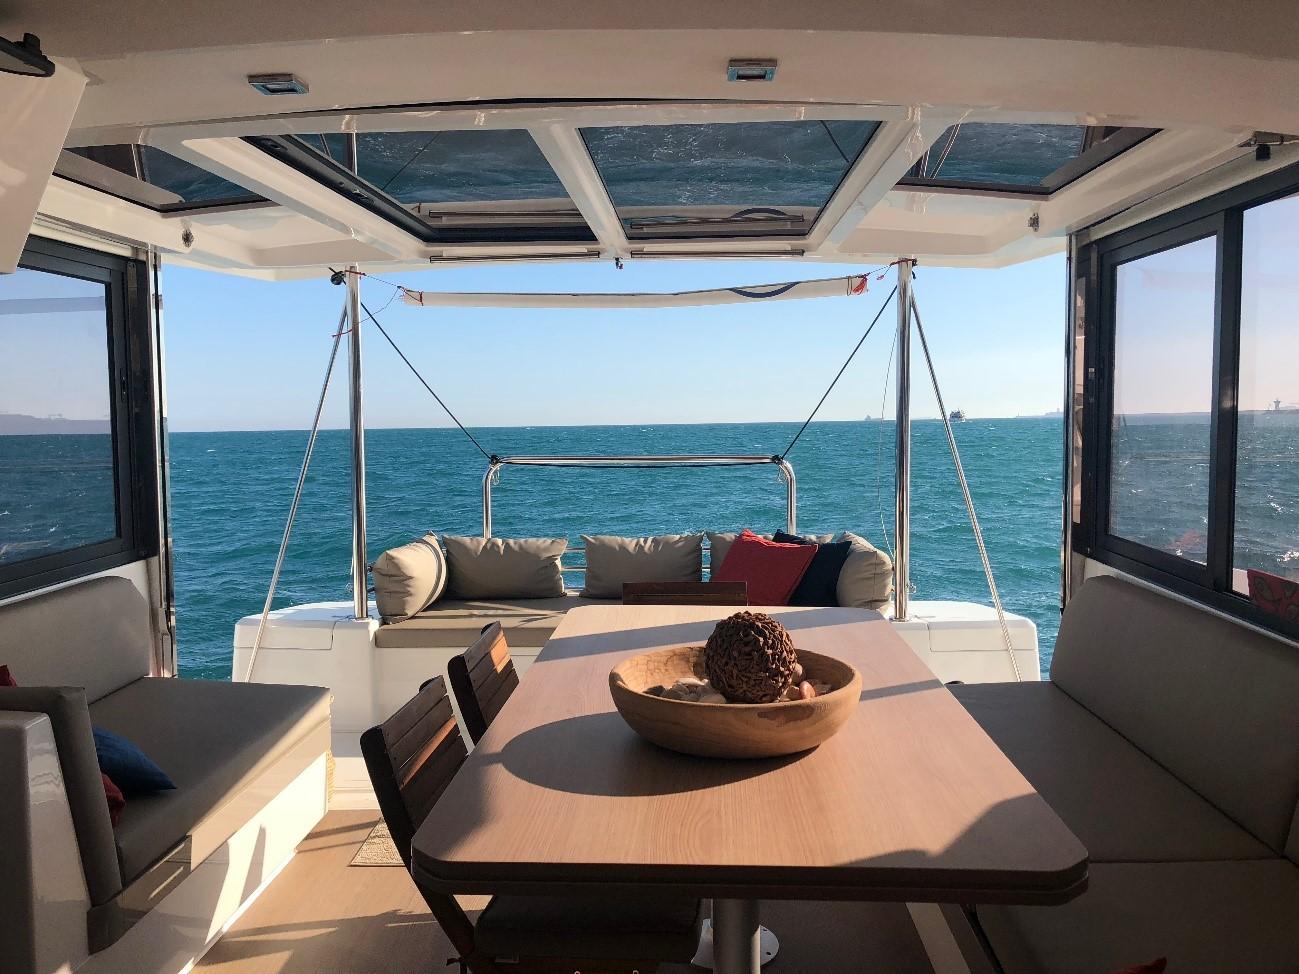 Luxury catamaran Barcelona